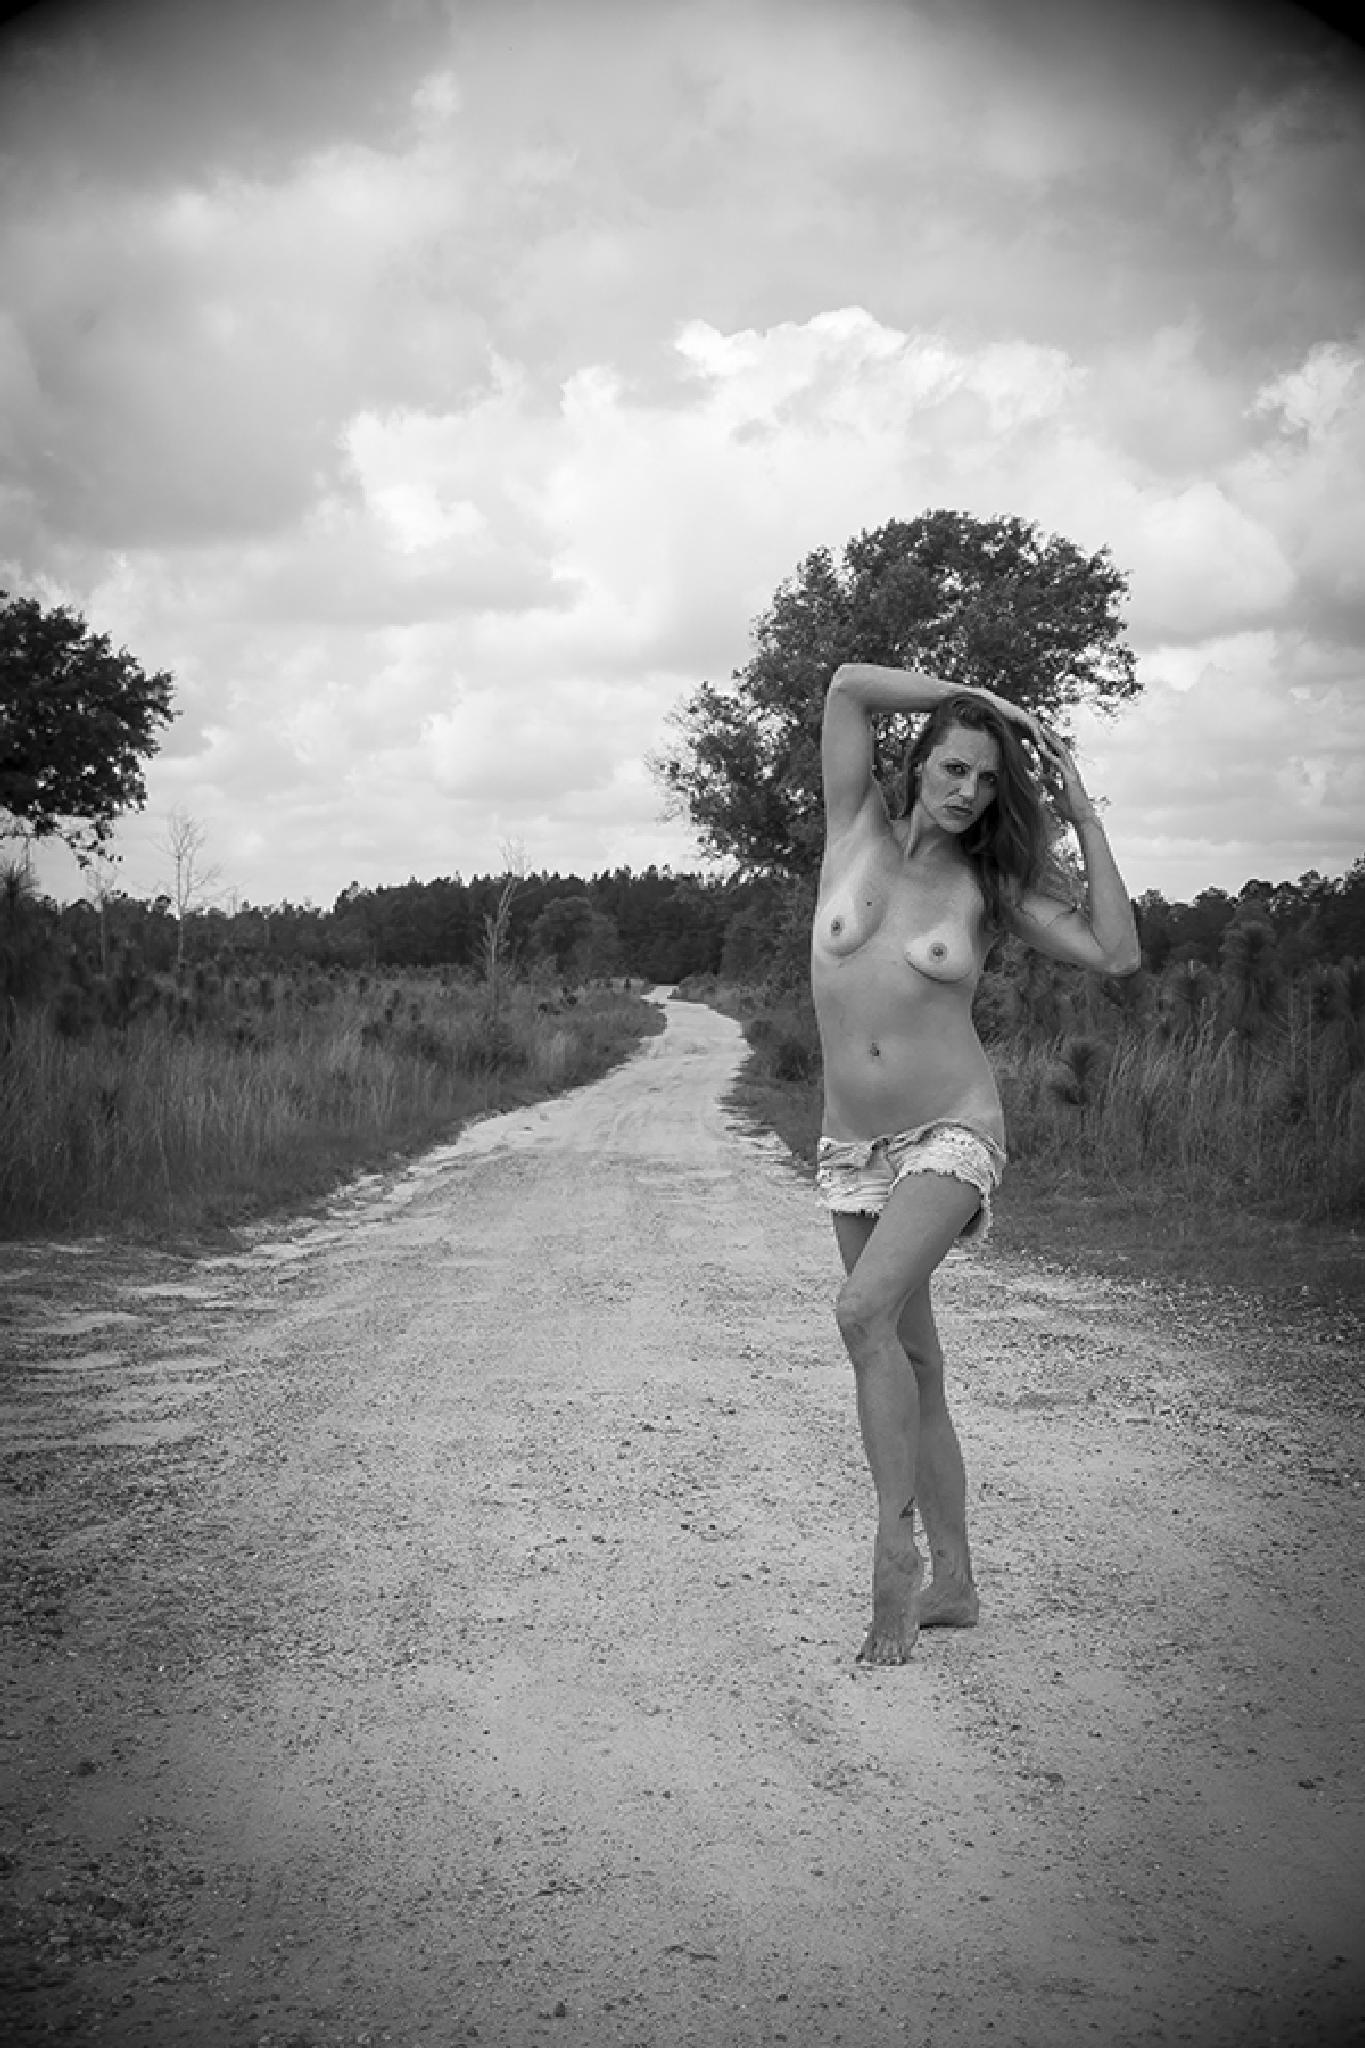 Dusty Roads by Click